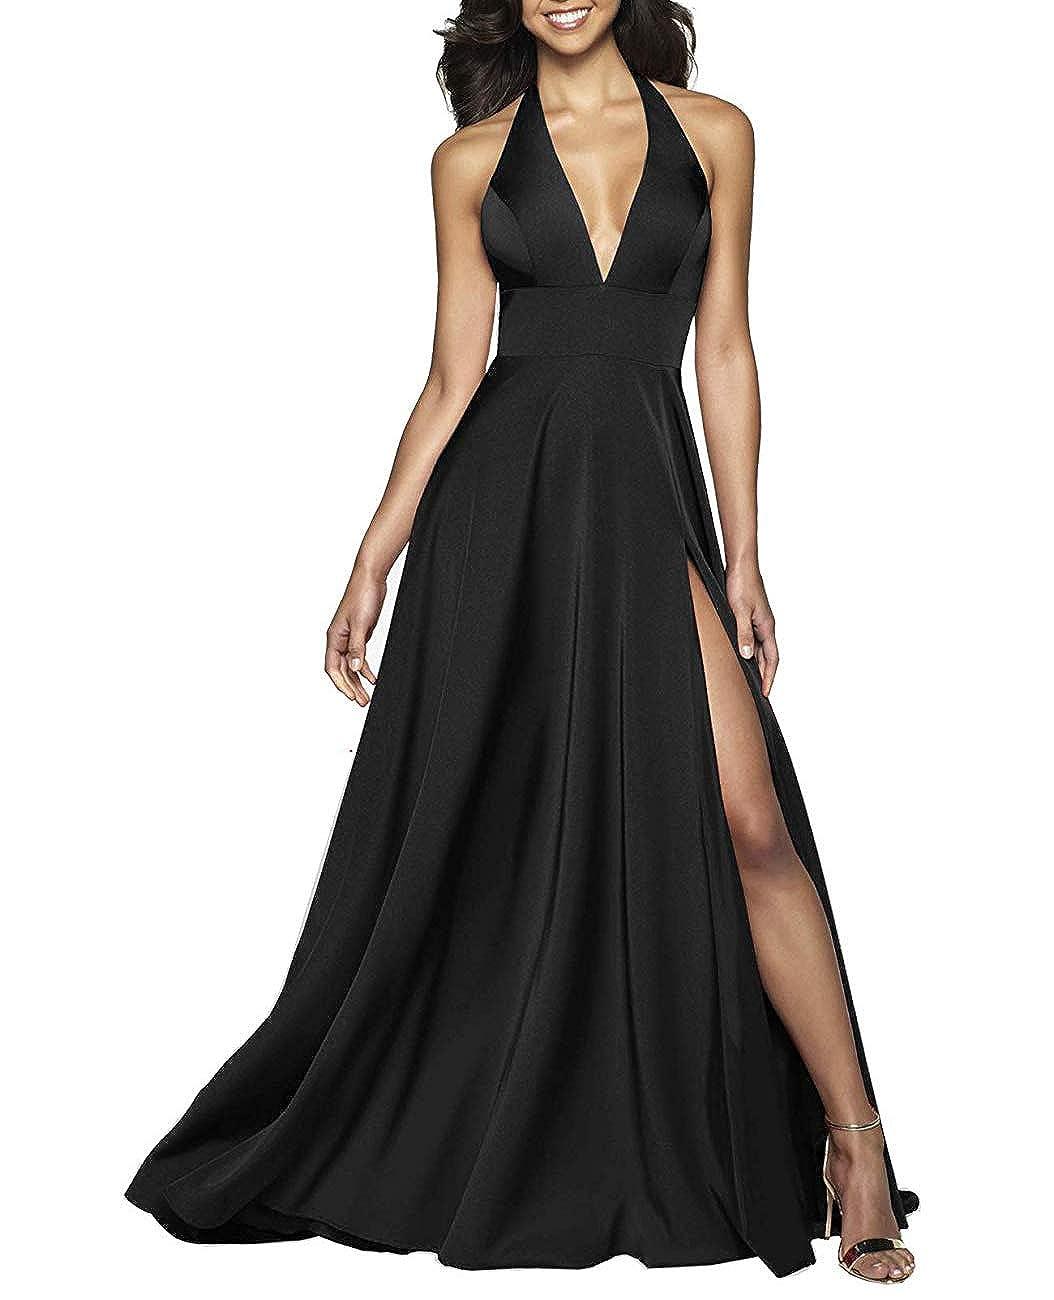 Black RTTUTED Satin VNeckline Long Prom Gown with Pockets Evening Dresses Sexy Split Skirt